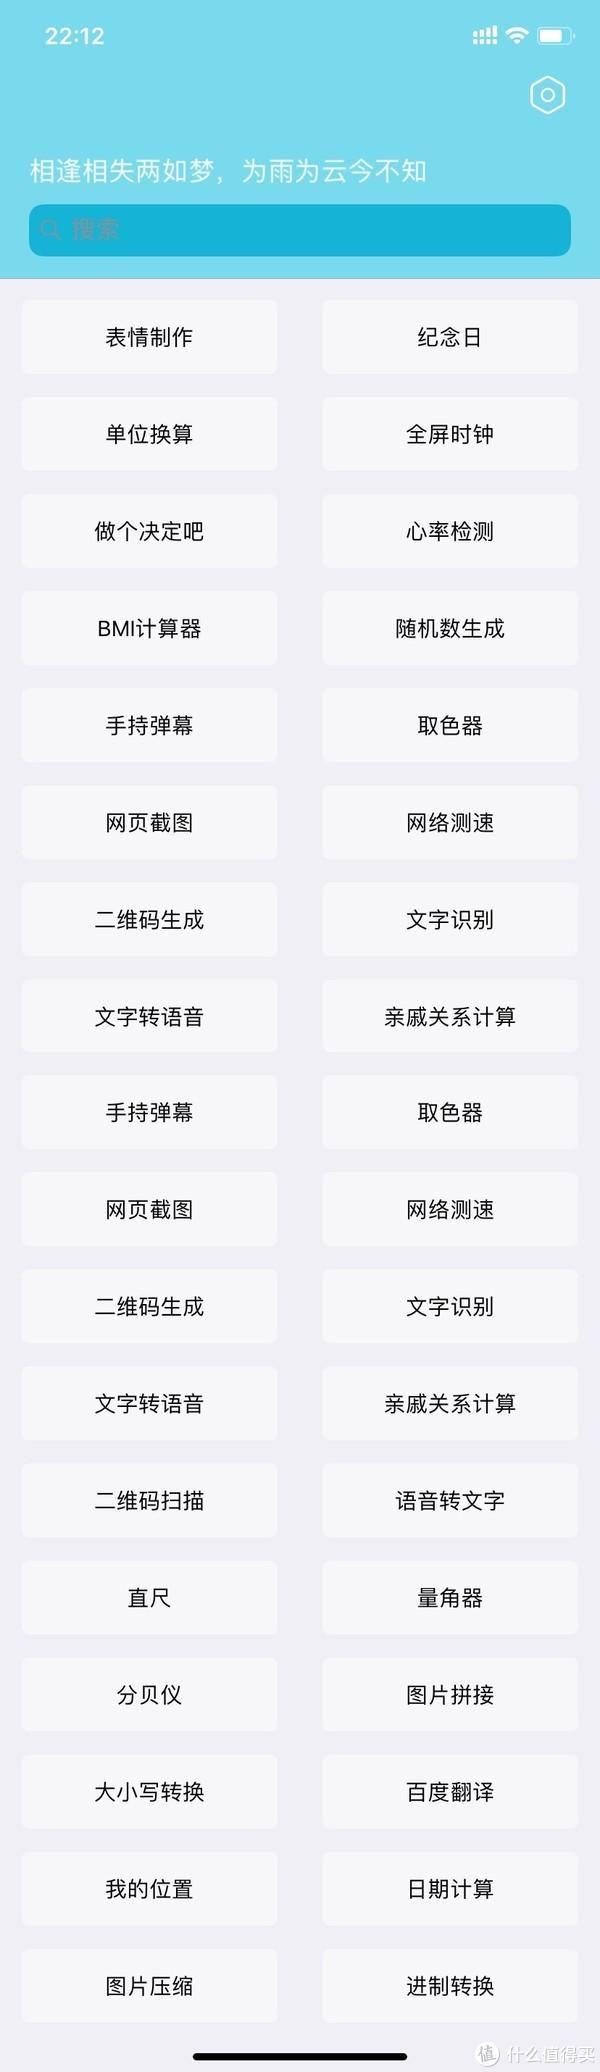 app现有功能